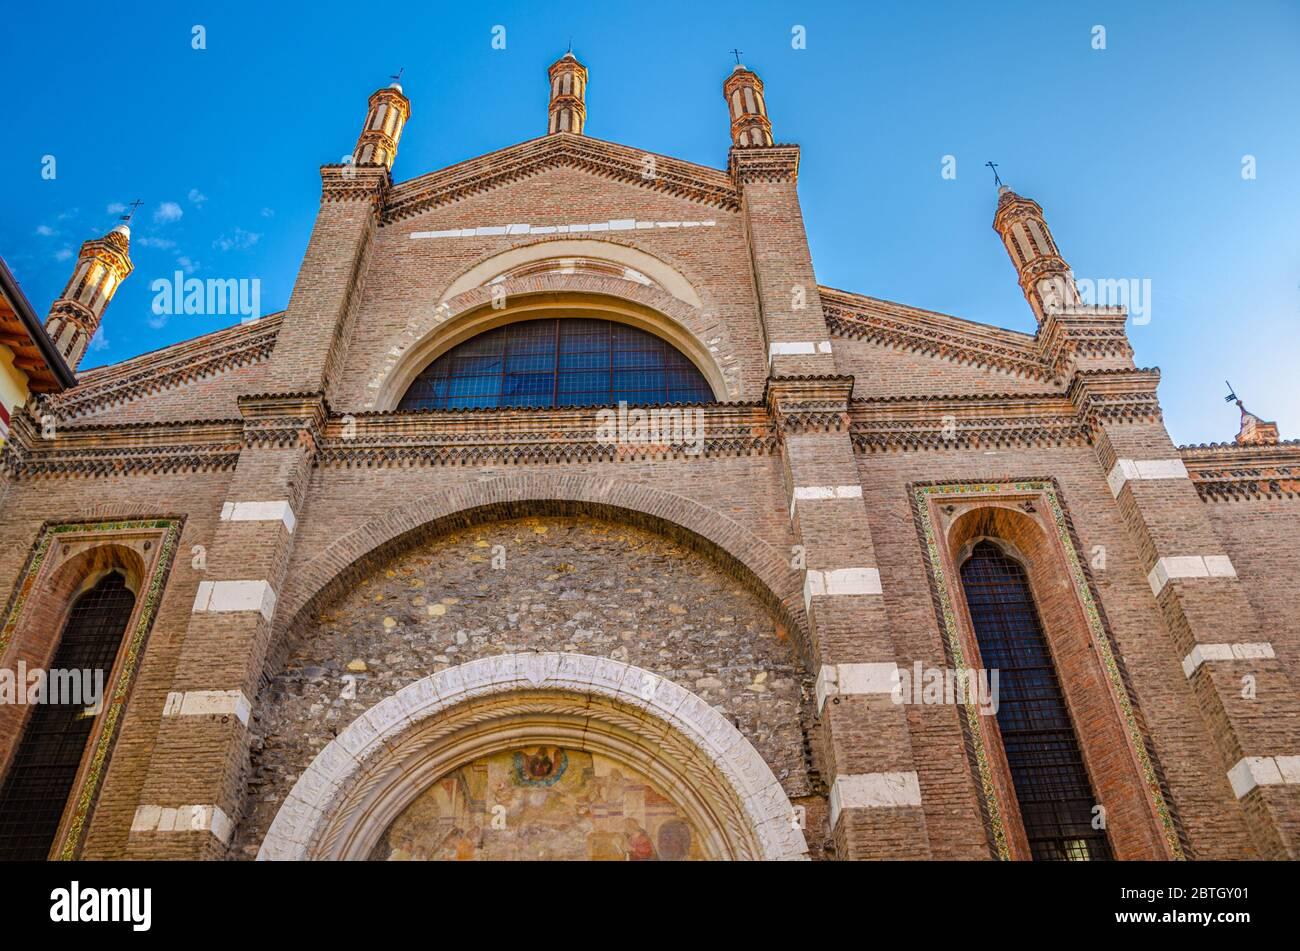 Chiesa di Santa Maria del Carmine Saint Maria of Carmine catholic church facade, Gothic style building, Brescia city historical centre, Italian churches, Lombardy, Northern Italy Stock Photo